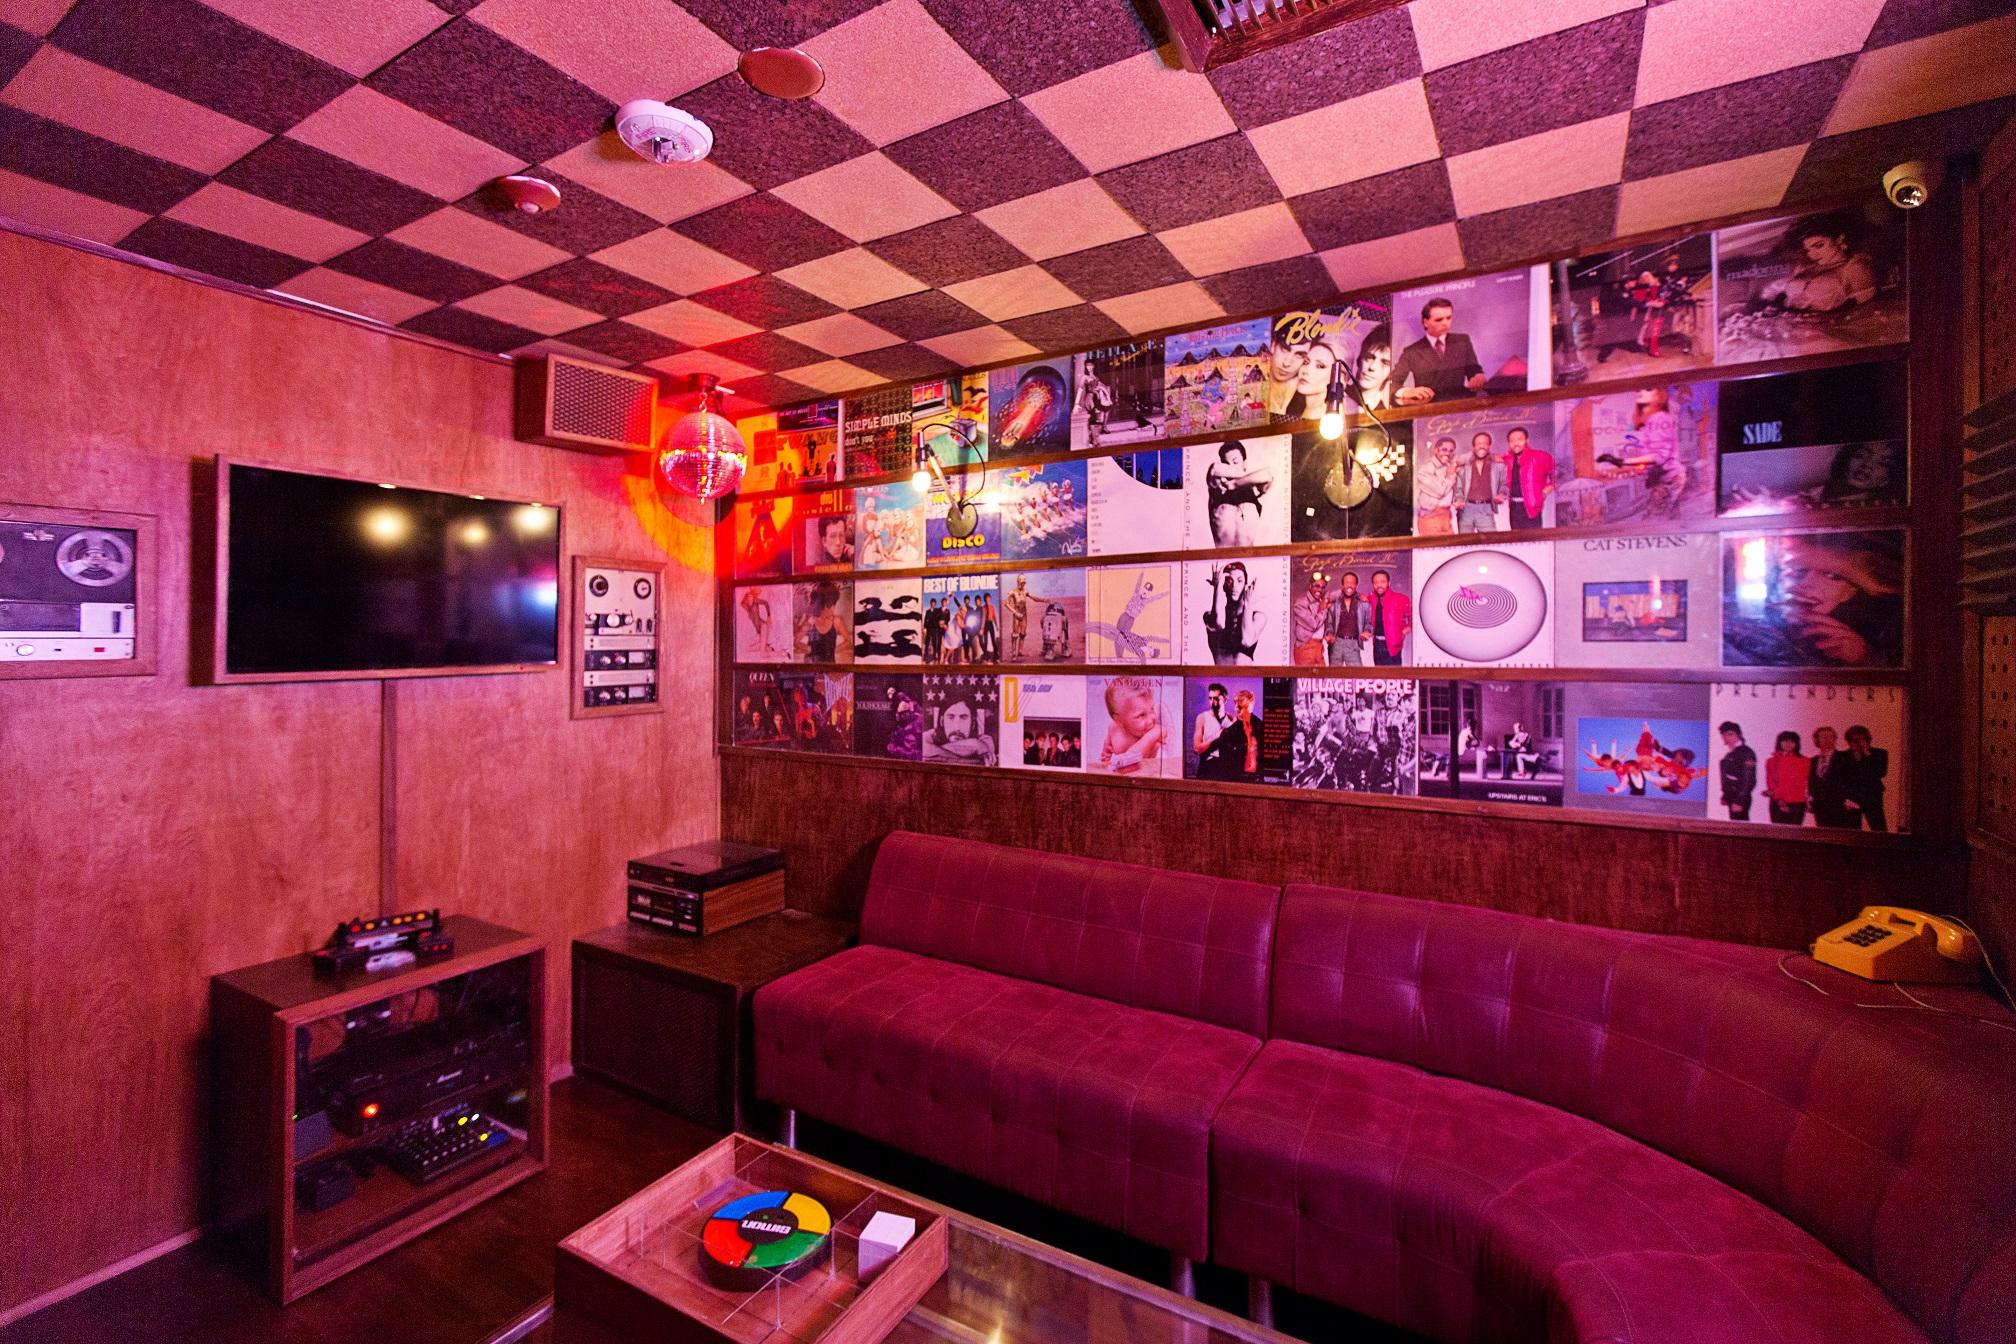 The karaoke room at Houston Hospitality's Break Room 86 in Los Angeles